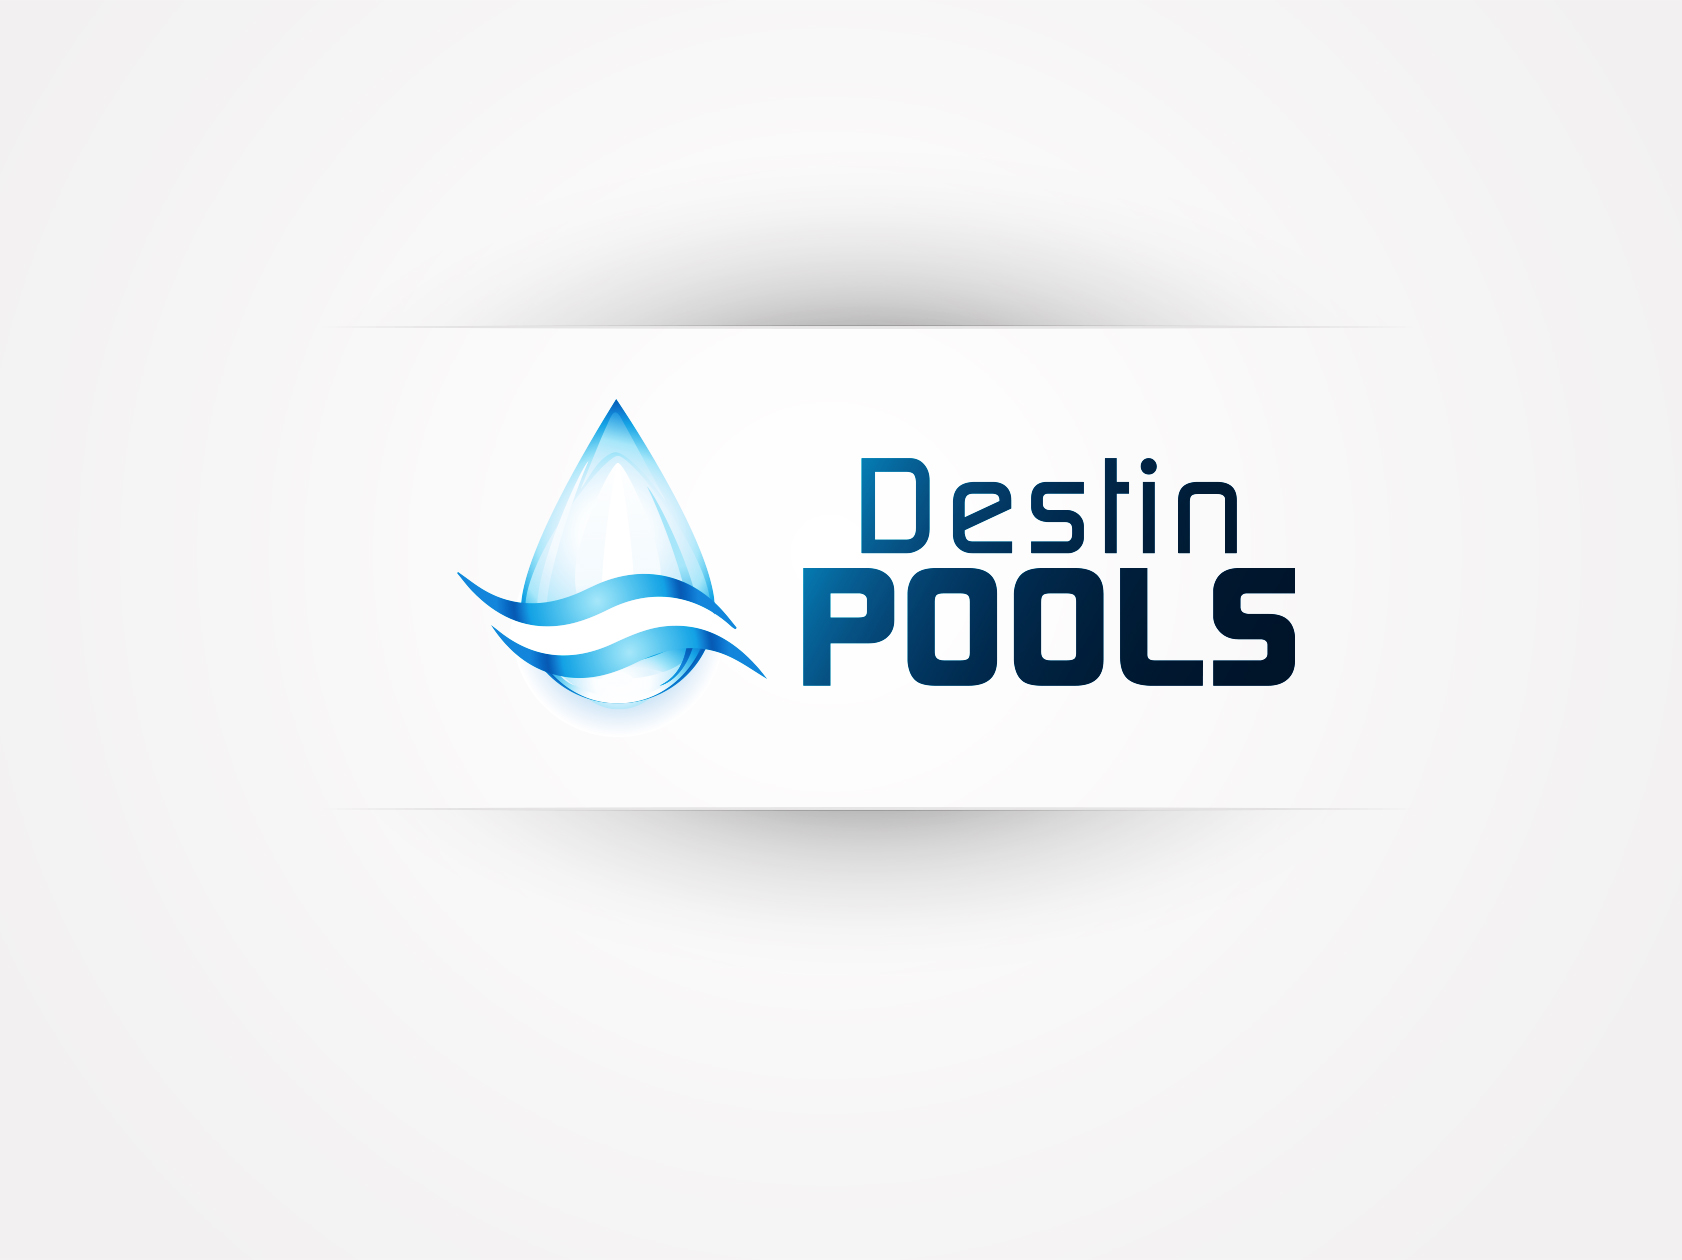 Logo Design by OmegaDesigns - Entry No. 108 in the Logo Design Contest Fun Logo Design for Destin Pools.